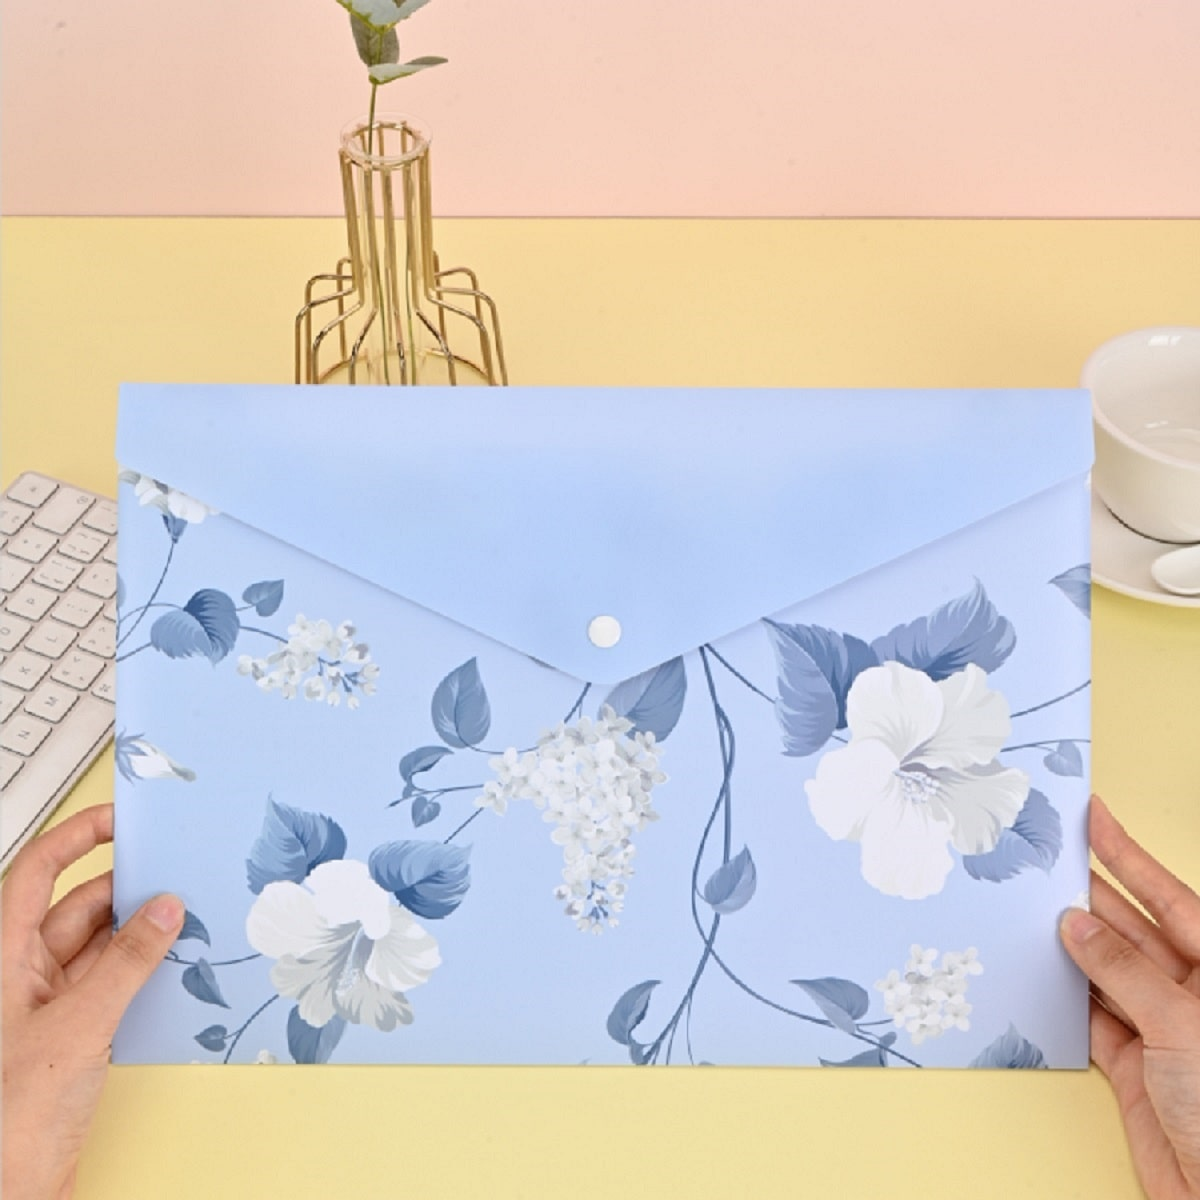 Bolsillo de lápiz con estampado de flor